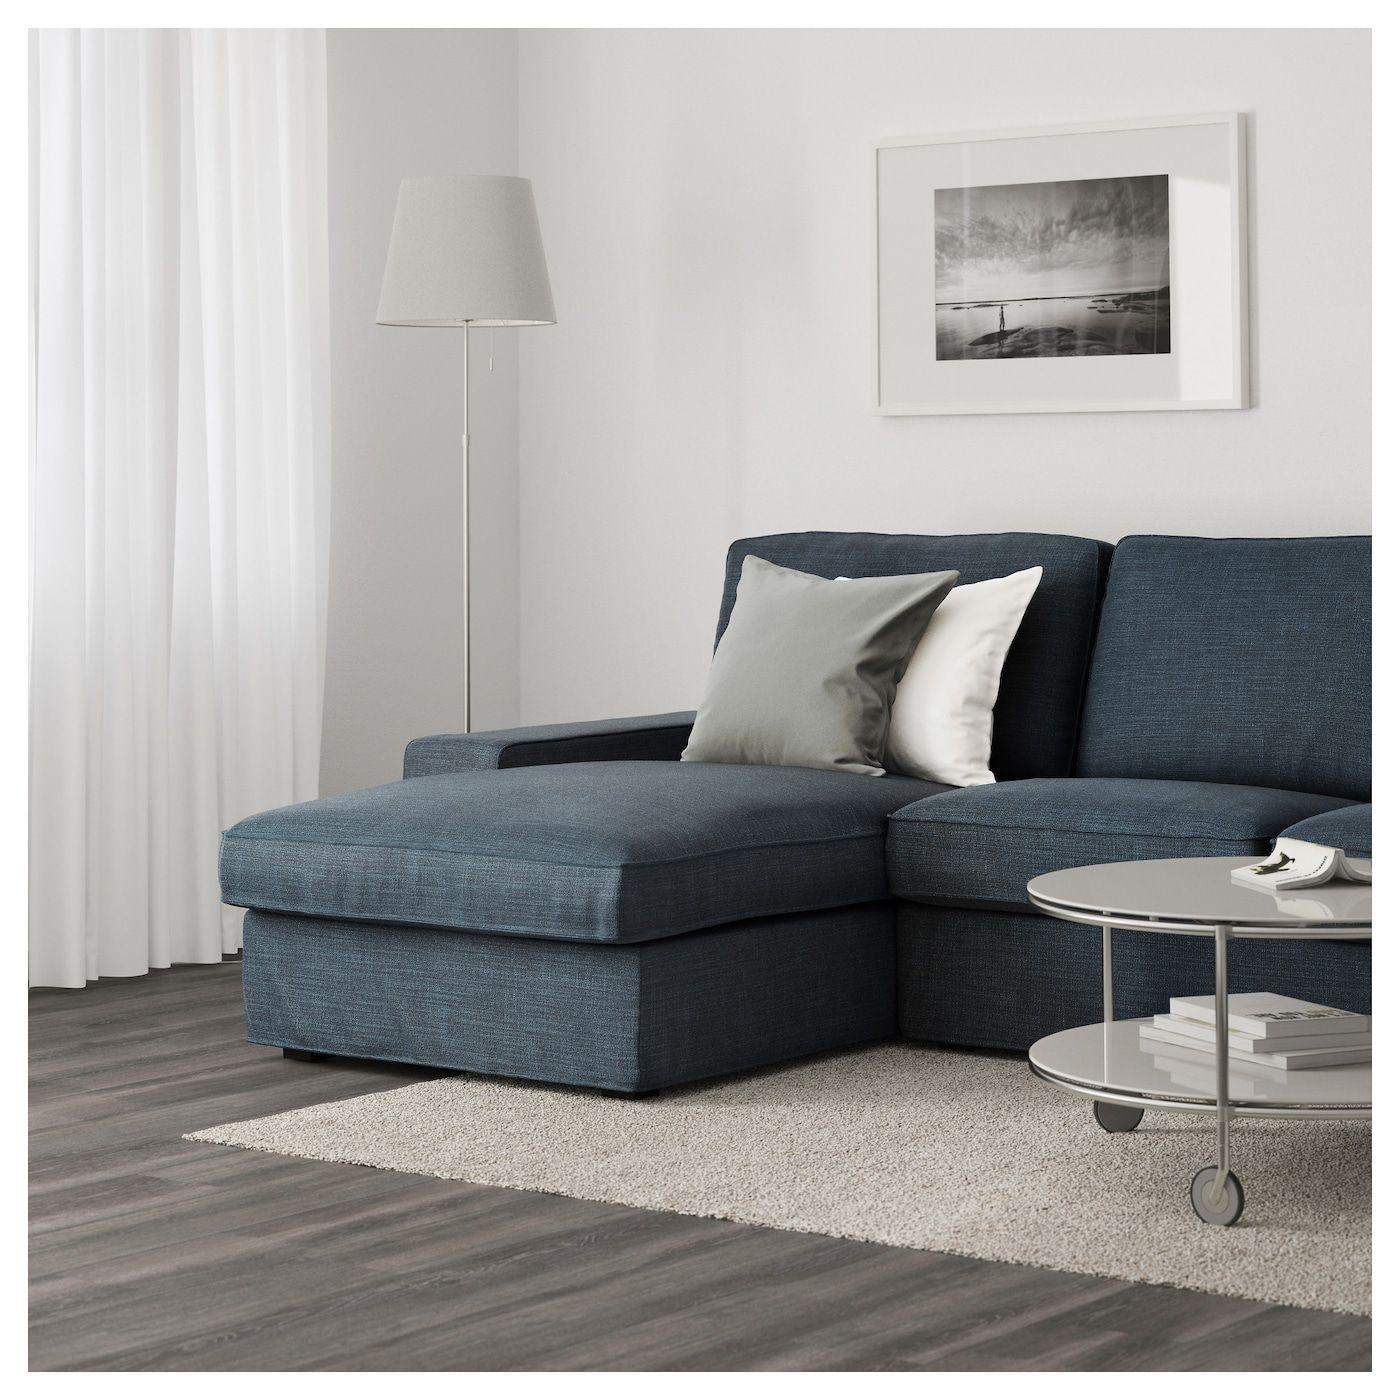 Kivik 3 Seat Sofa Hillared With Chaise Longue Hillared Dark Blue Ikea Austria 3seat Austria Blue Chaise Dark In 2020 Kivik Sofa Ikea Kivik Living Room Designs